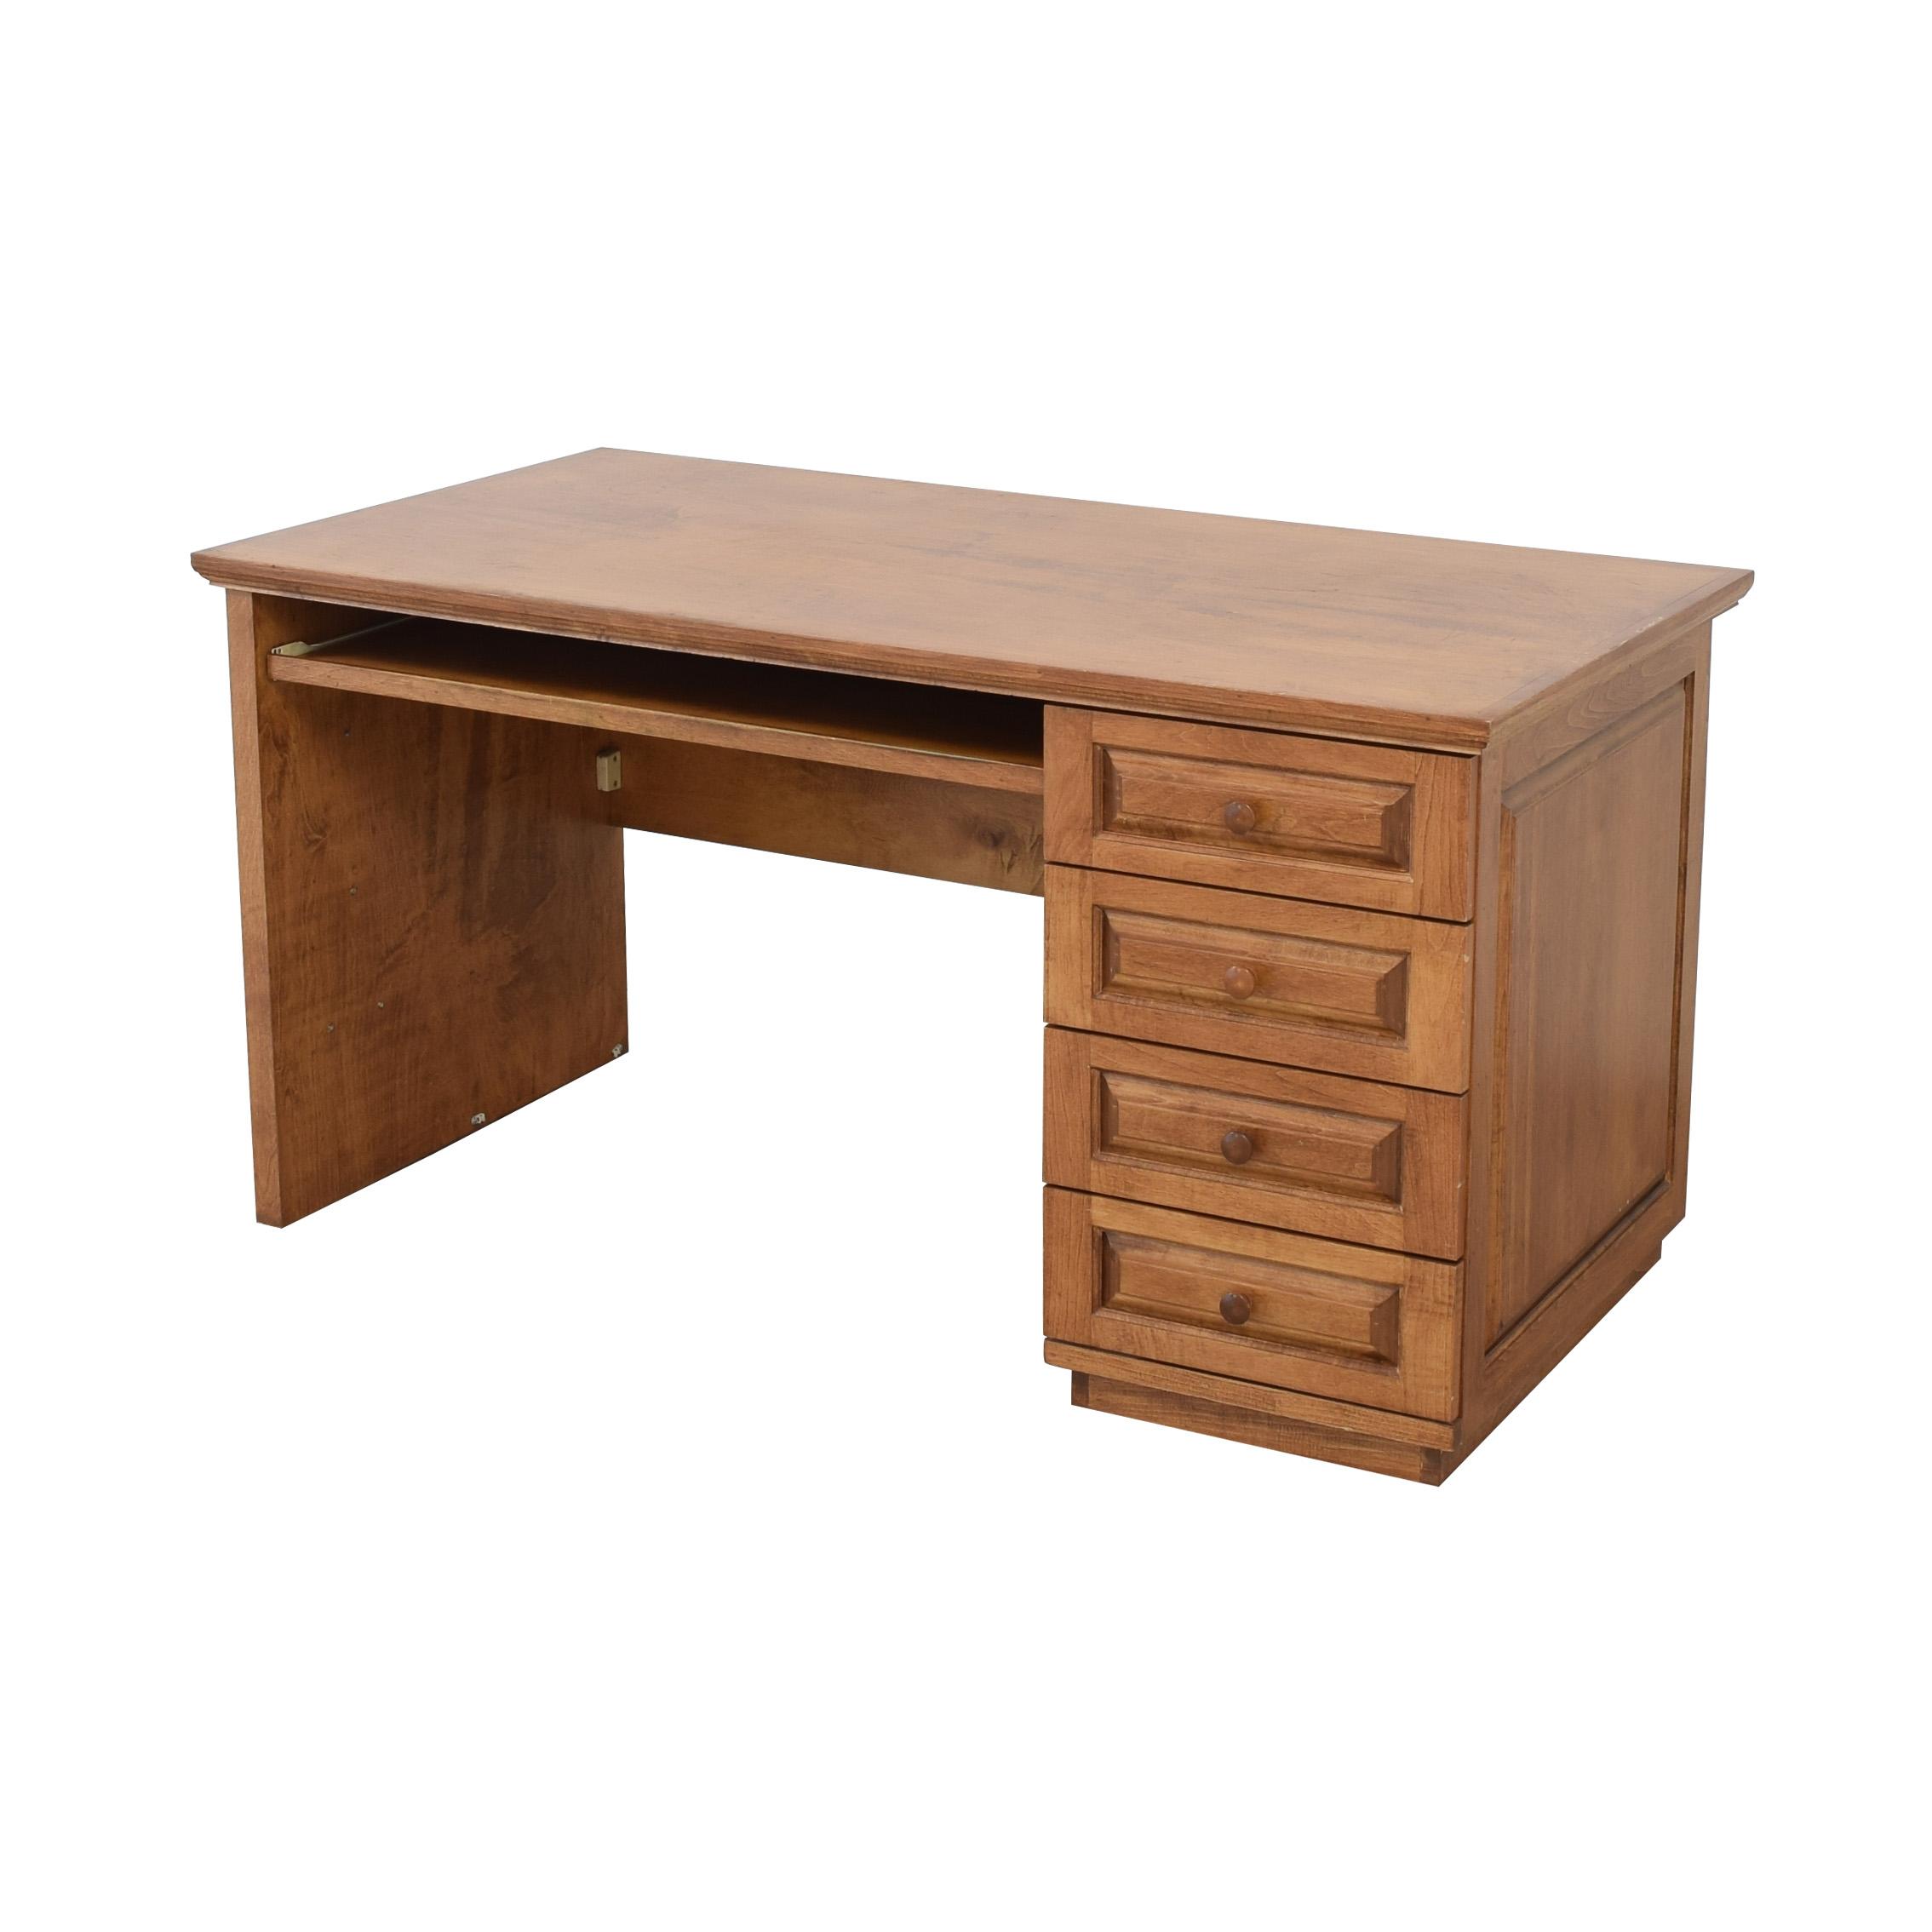 Gothic Cabinet Craft Gothic Cabinet Craft Executive Desk for sale